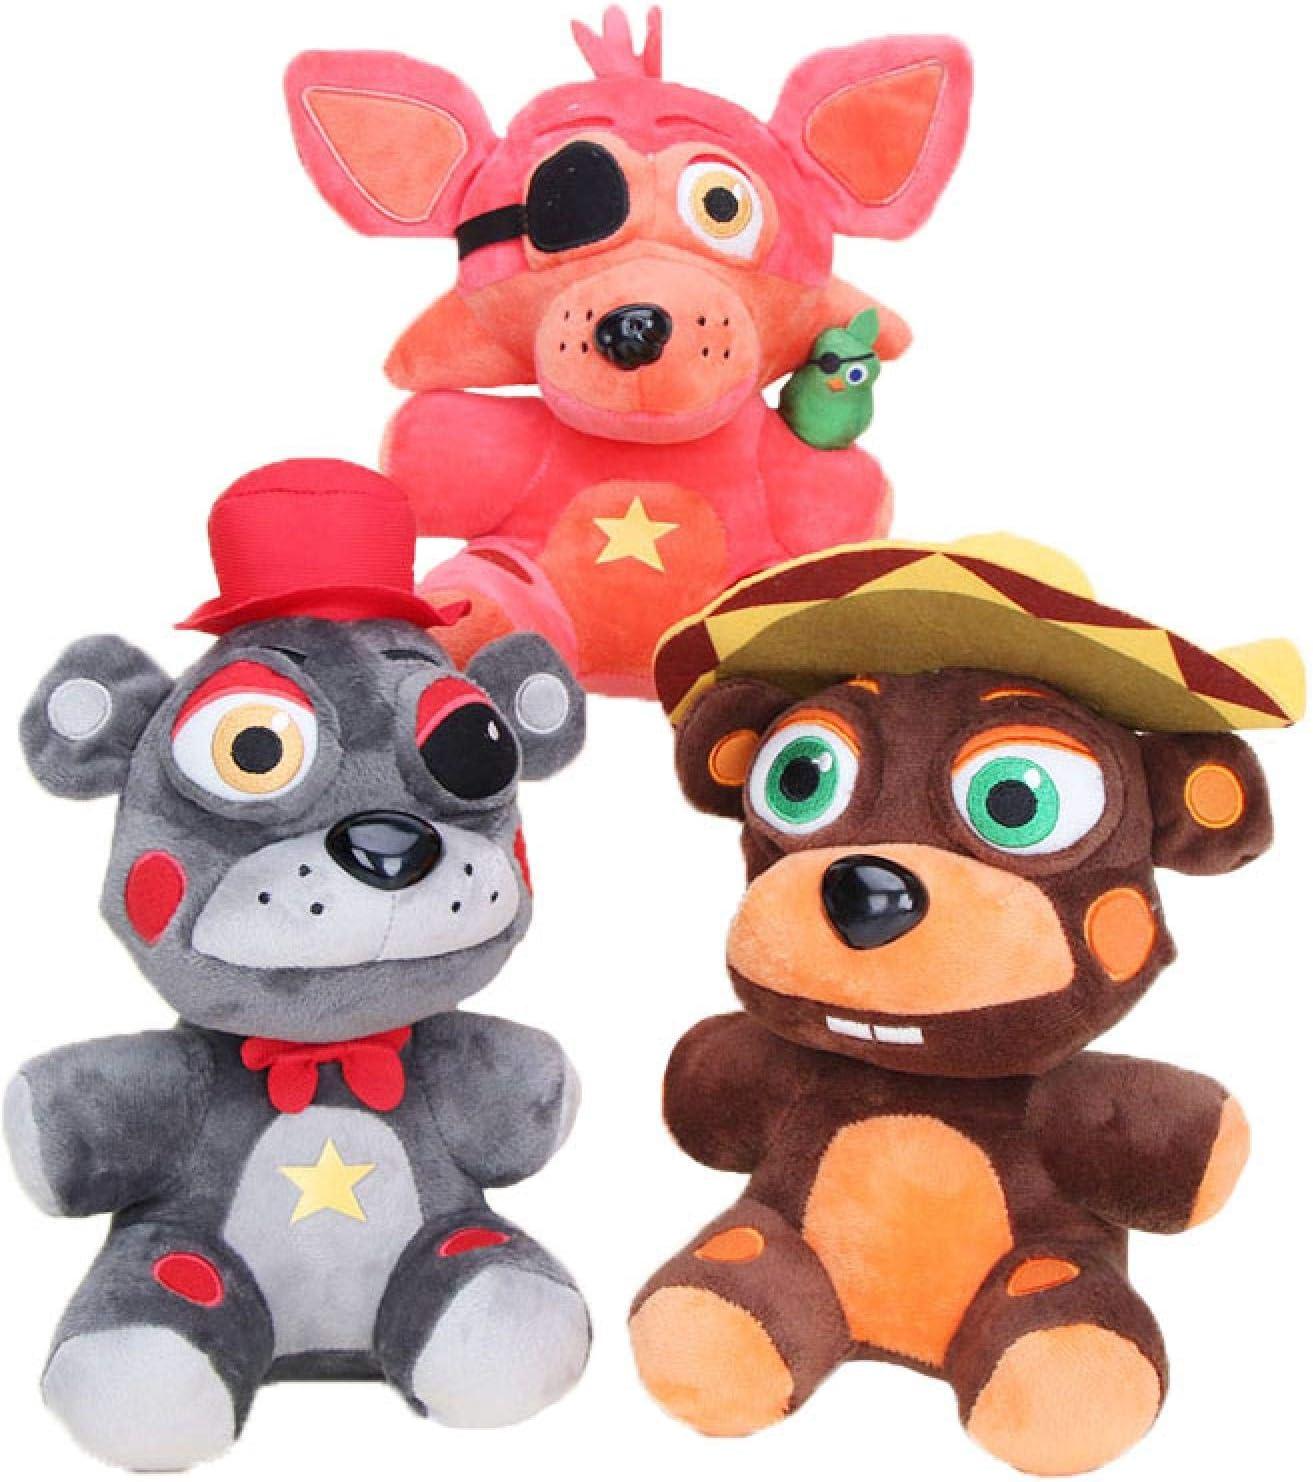 jingru Five Night At Freddy Plush Toy FNAF Freddy'S Plush Toys 3 Piezas 18Cm, Muñecos De Peluche, Oso, Conejo, Juego, Niños